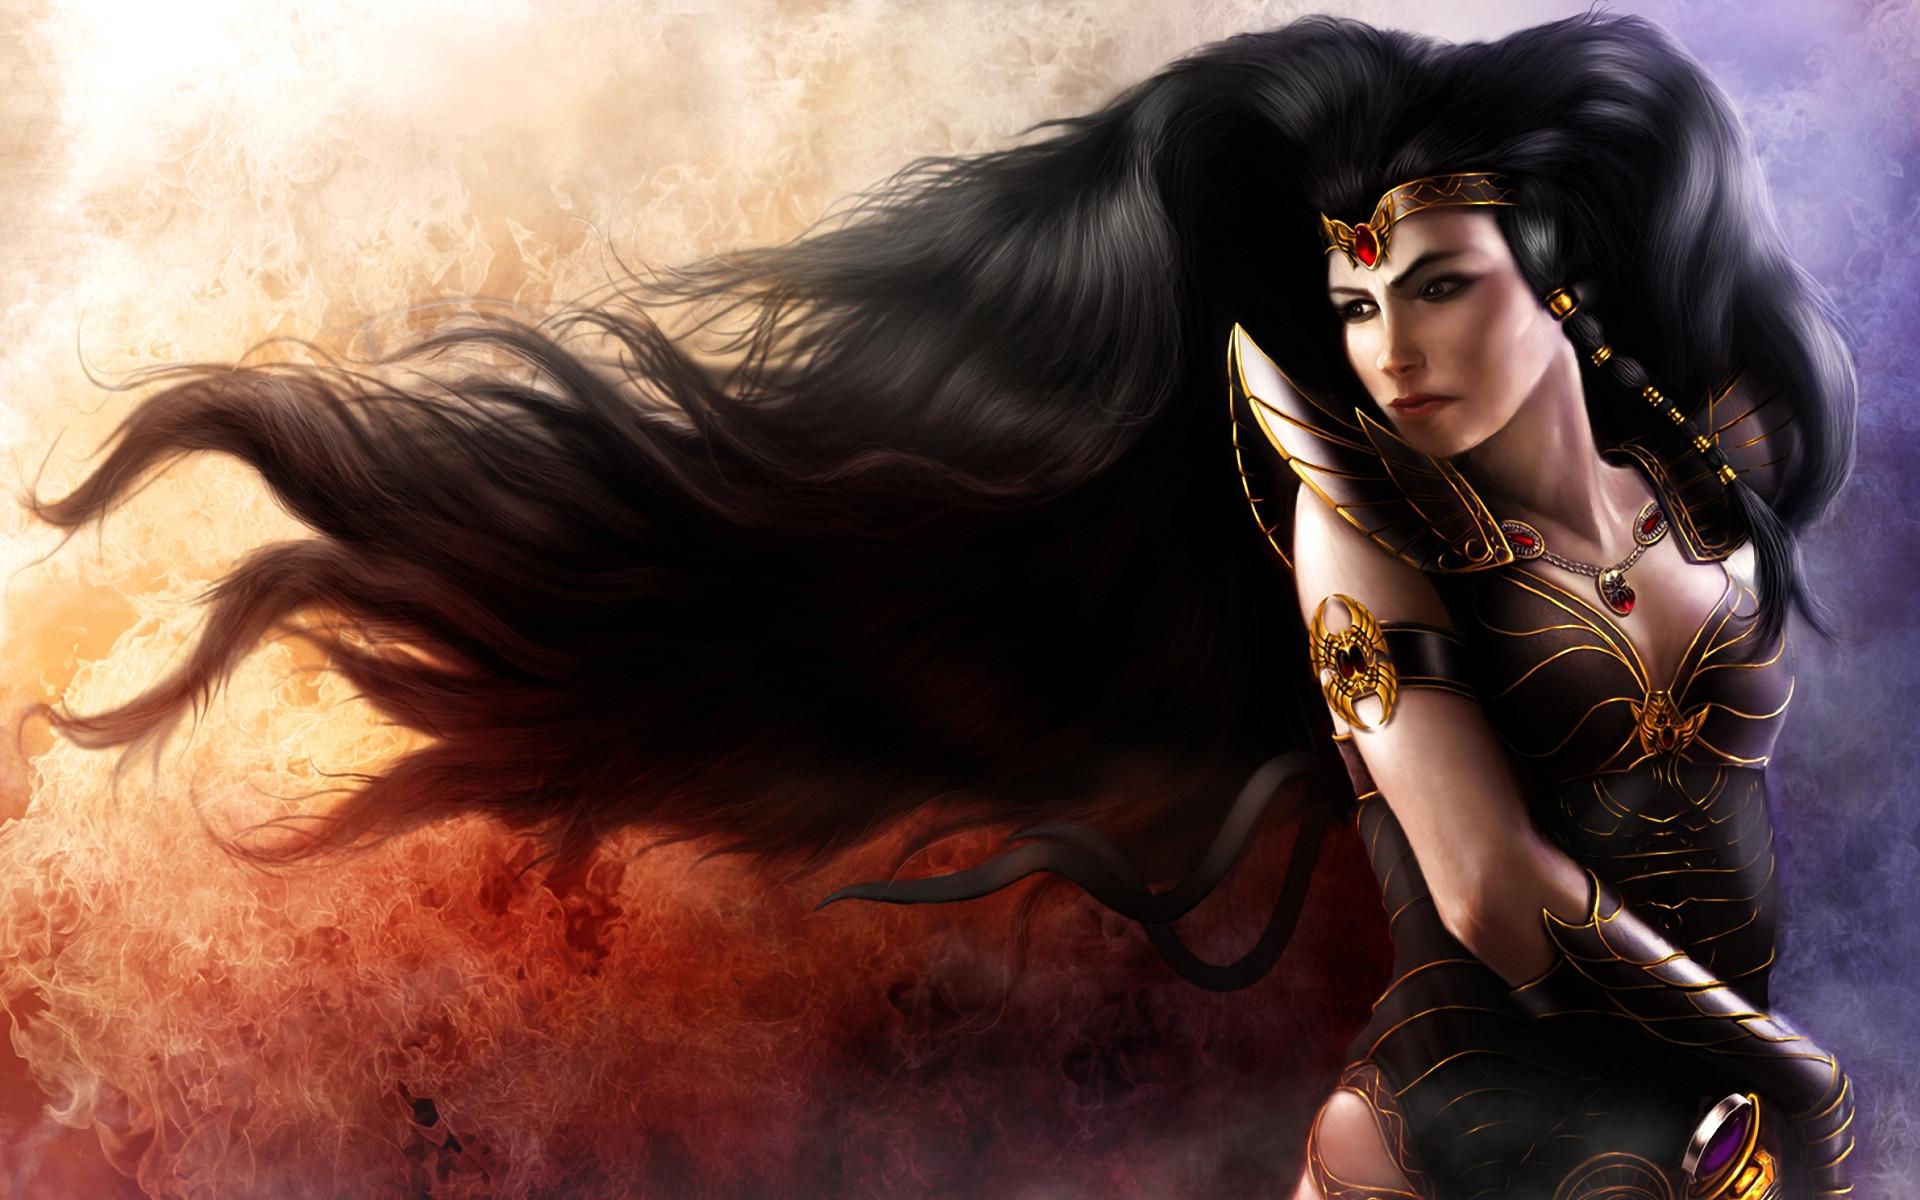 Fantasy – Women Warrior Long Hair Armor Headband Sword Woman Warrior Girl  Woman Black Hair Fantasy